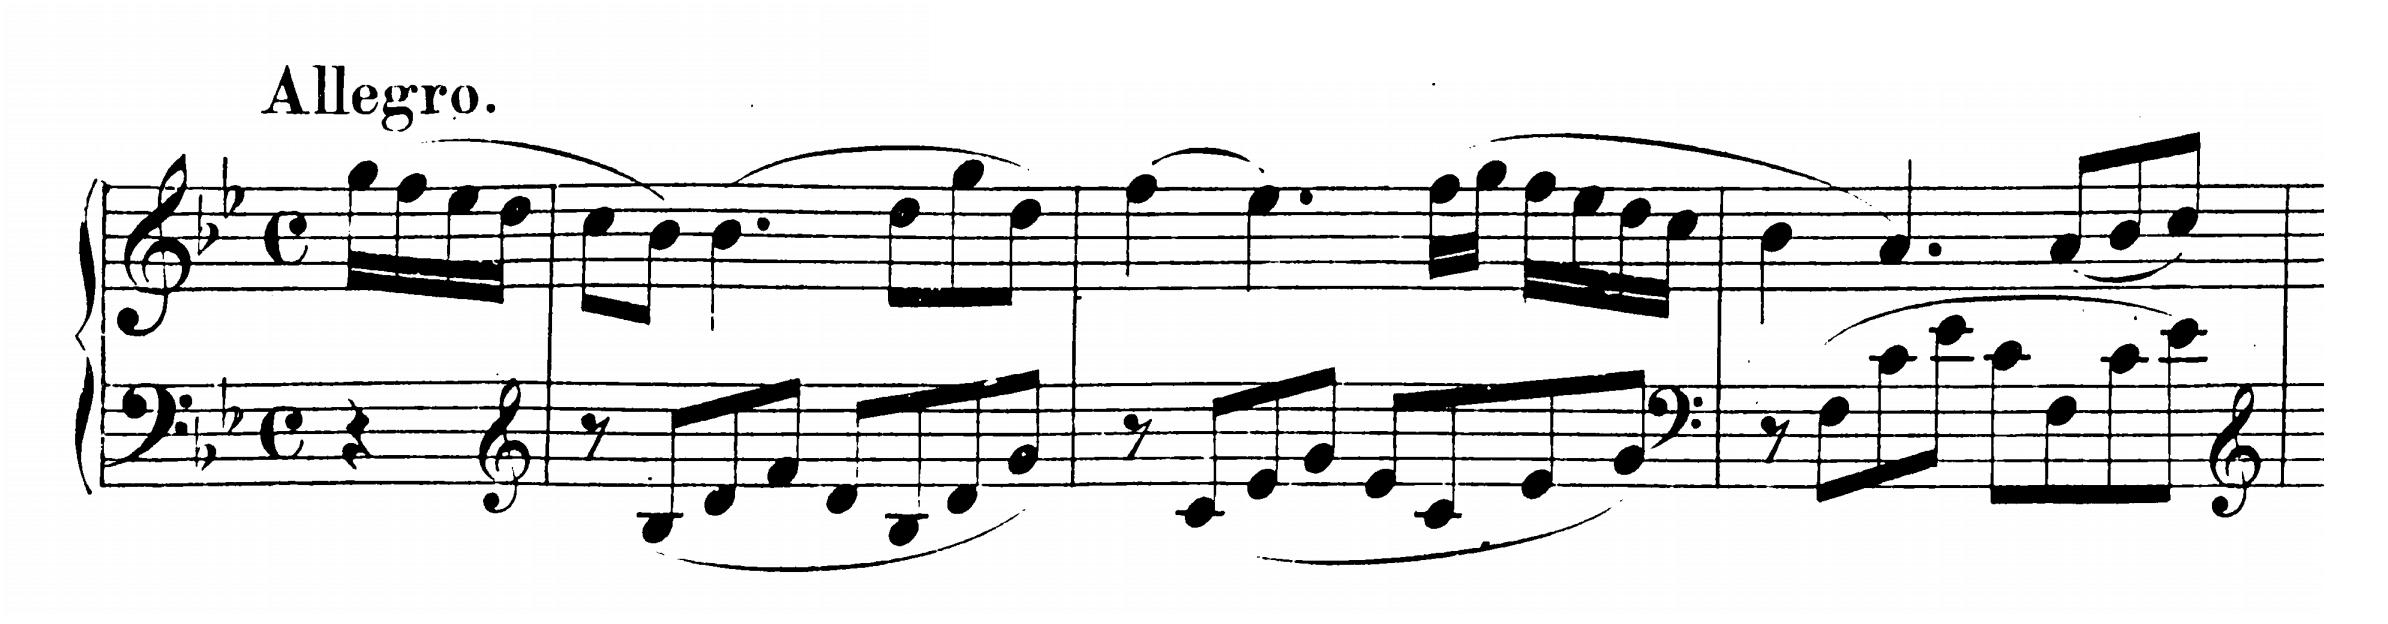 Mozart Piano Sonata No13 In B Flat Major K333 Analysis